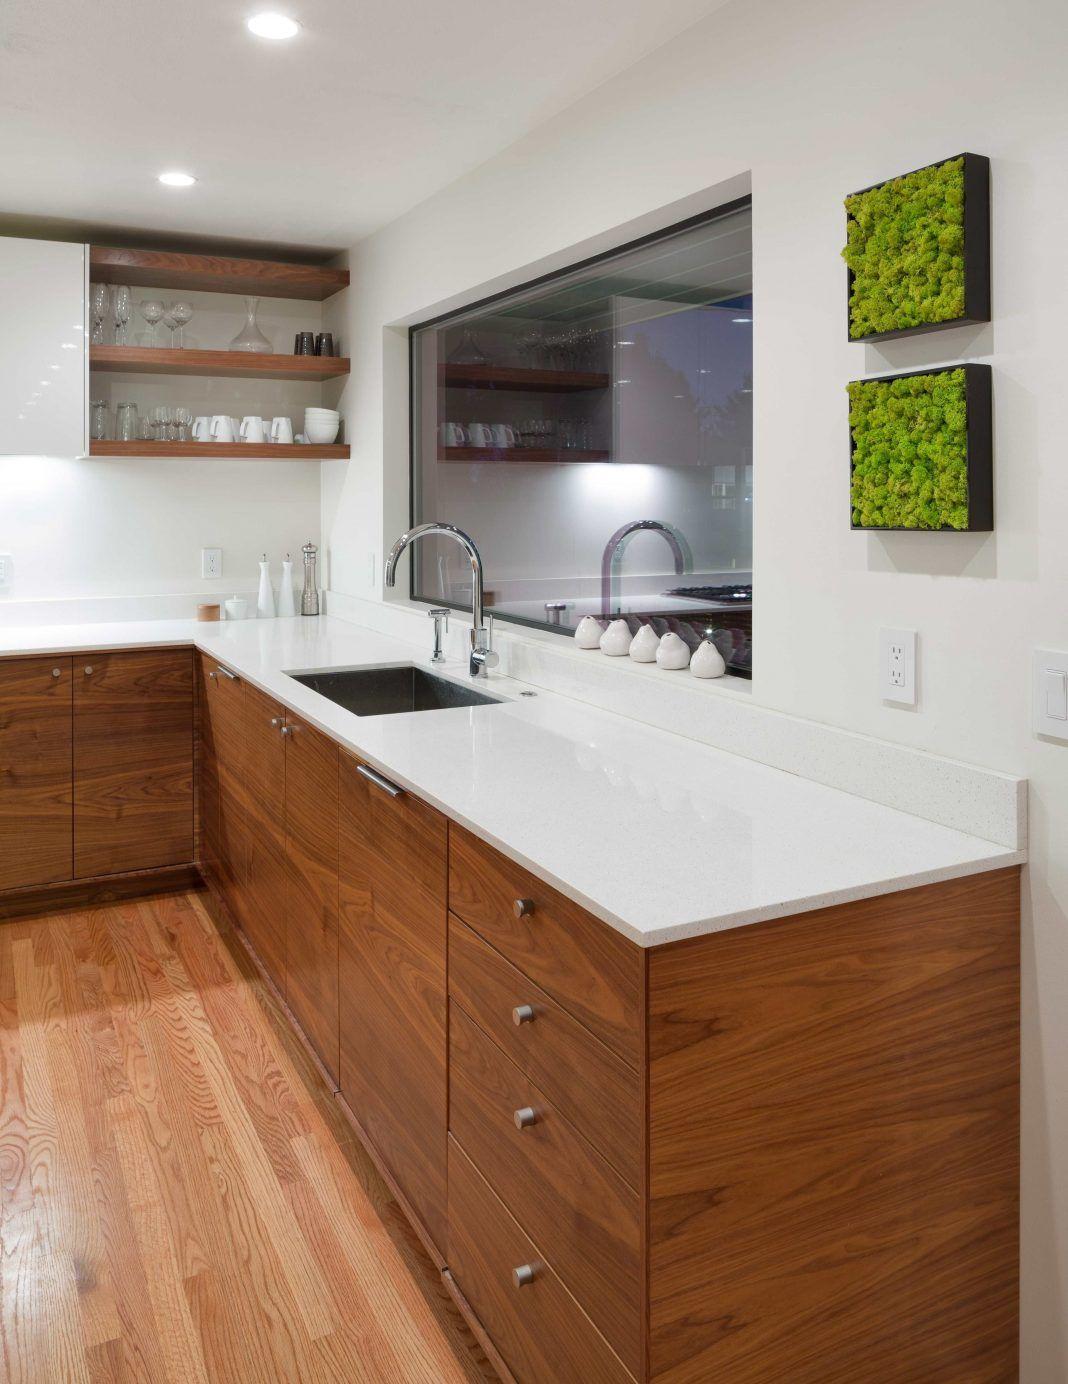 dorable modern kitchen cabinets design a050f49782729f415949cf98e5ef9ec2 in 2020 modern kitchen on kitchen cabinets modern contemporary id=75192